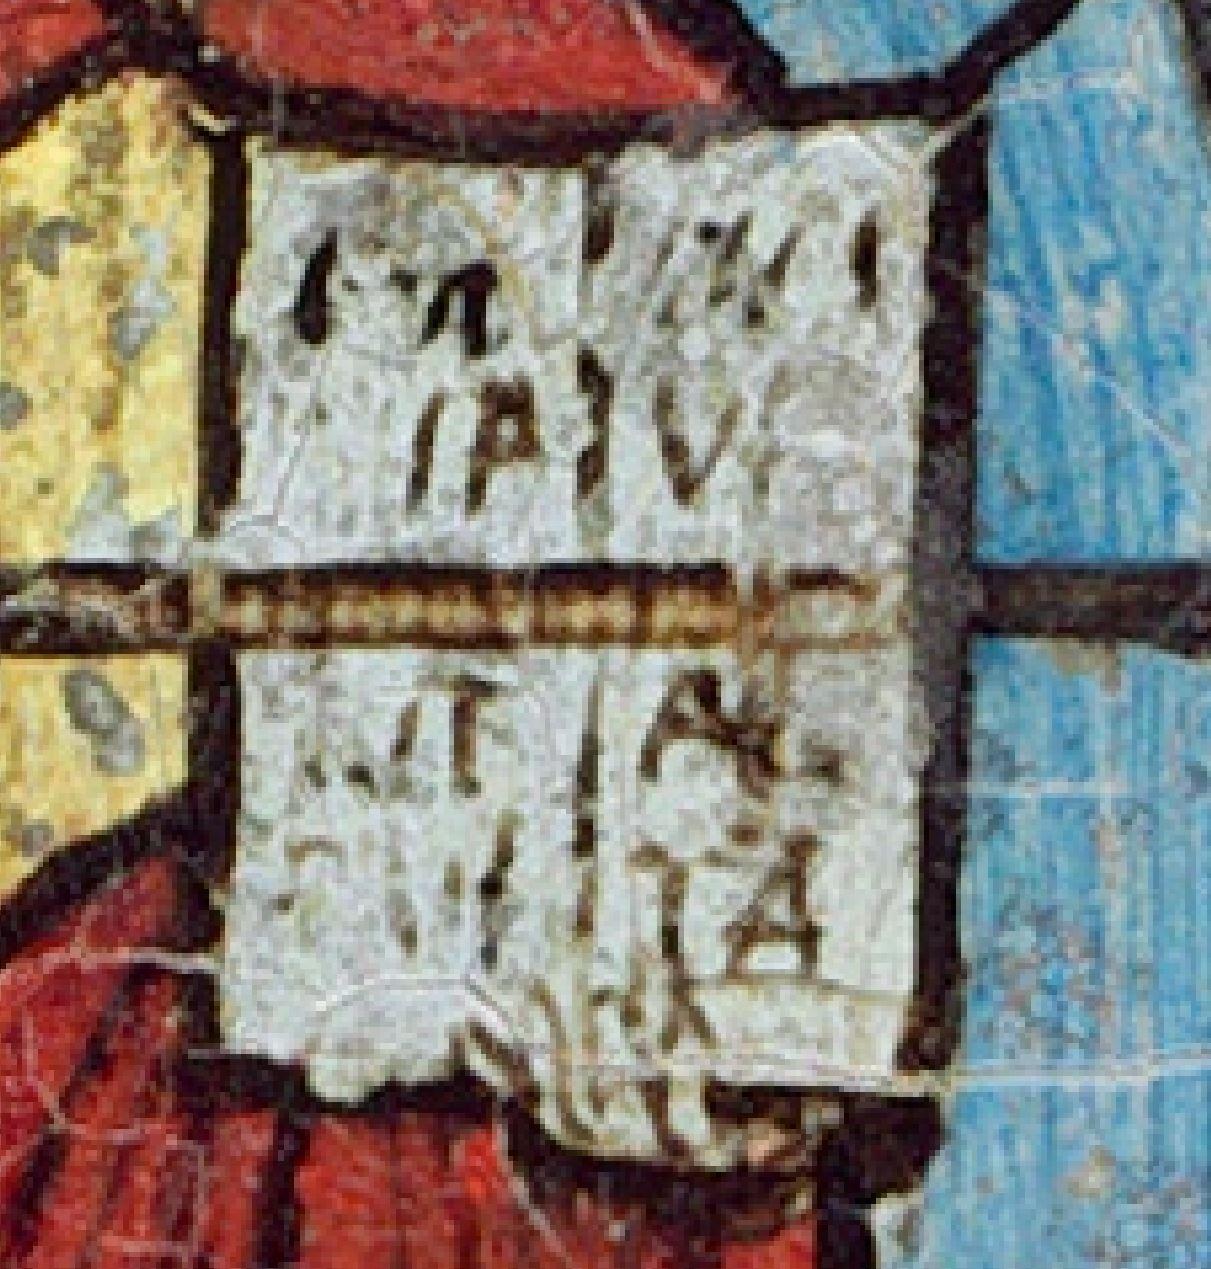 Van Eyck Annonciation 1434-36 NGA detail livre